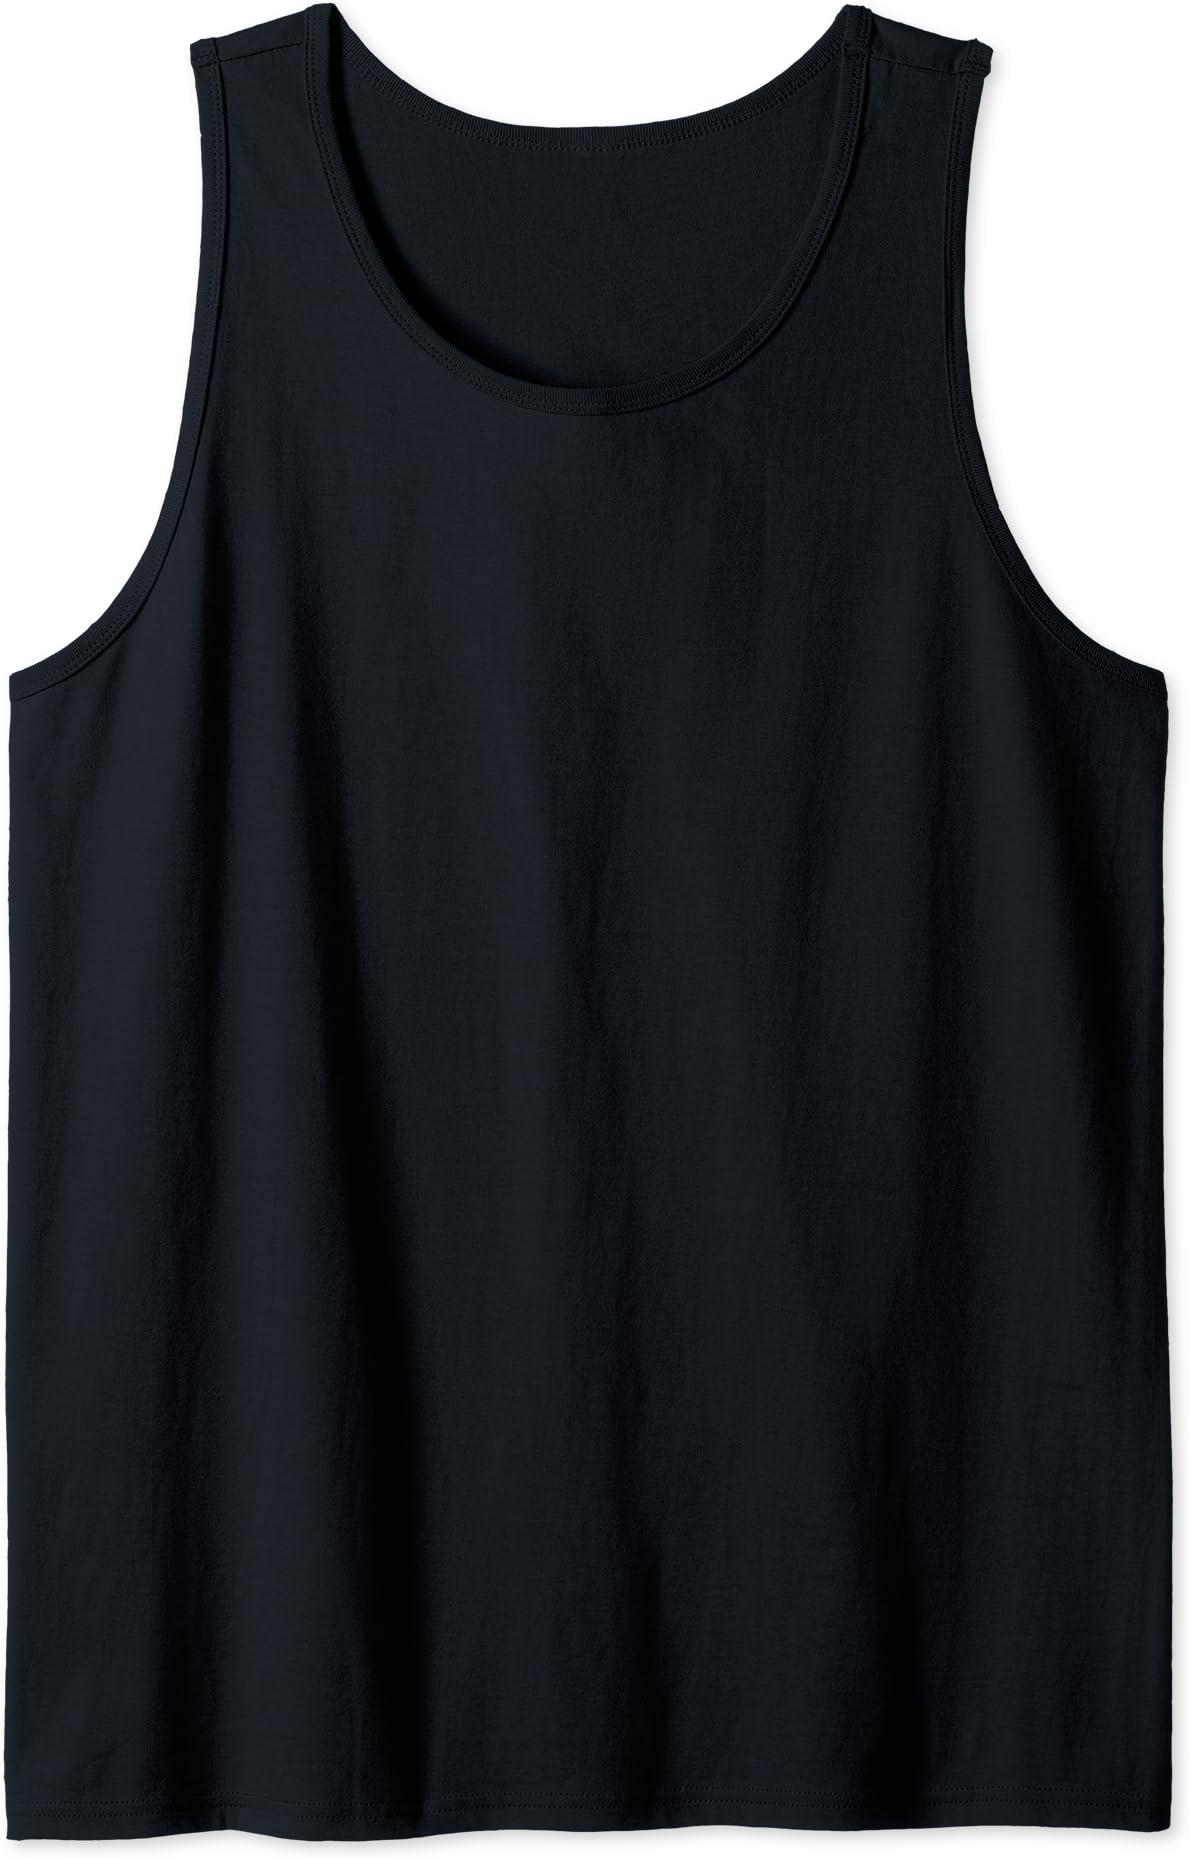 Heavy Metal Tank Vest Sleeveless Top T-Shirt T-Shirt Hard Rock Gig Music Loud